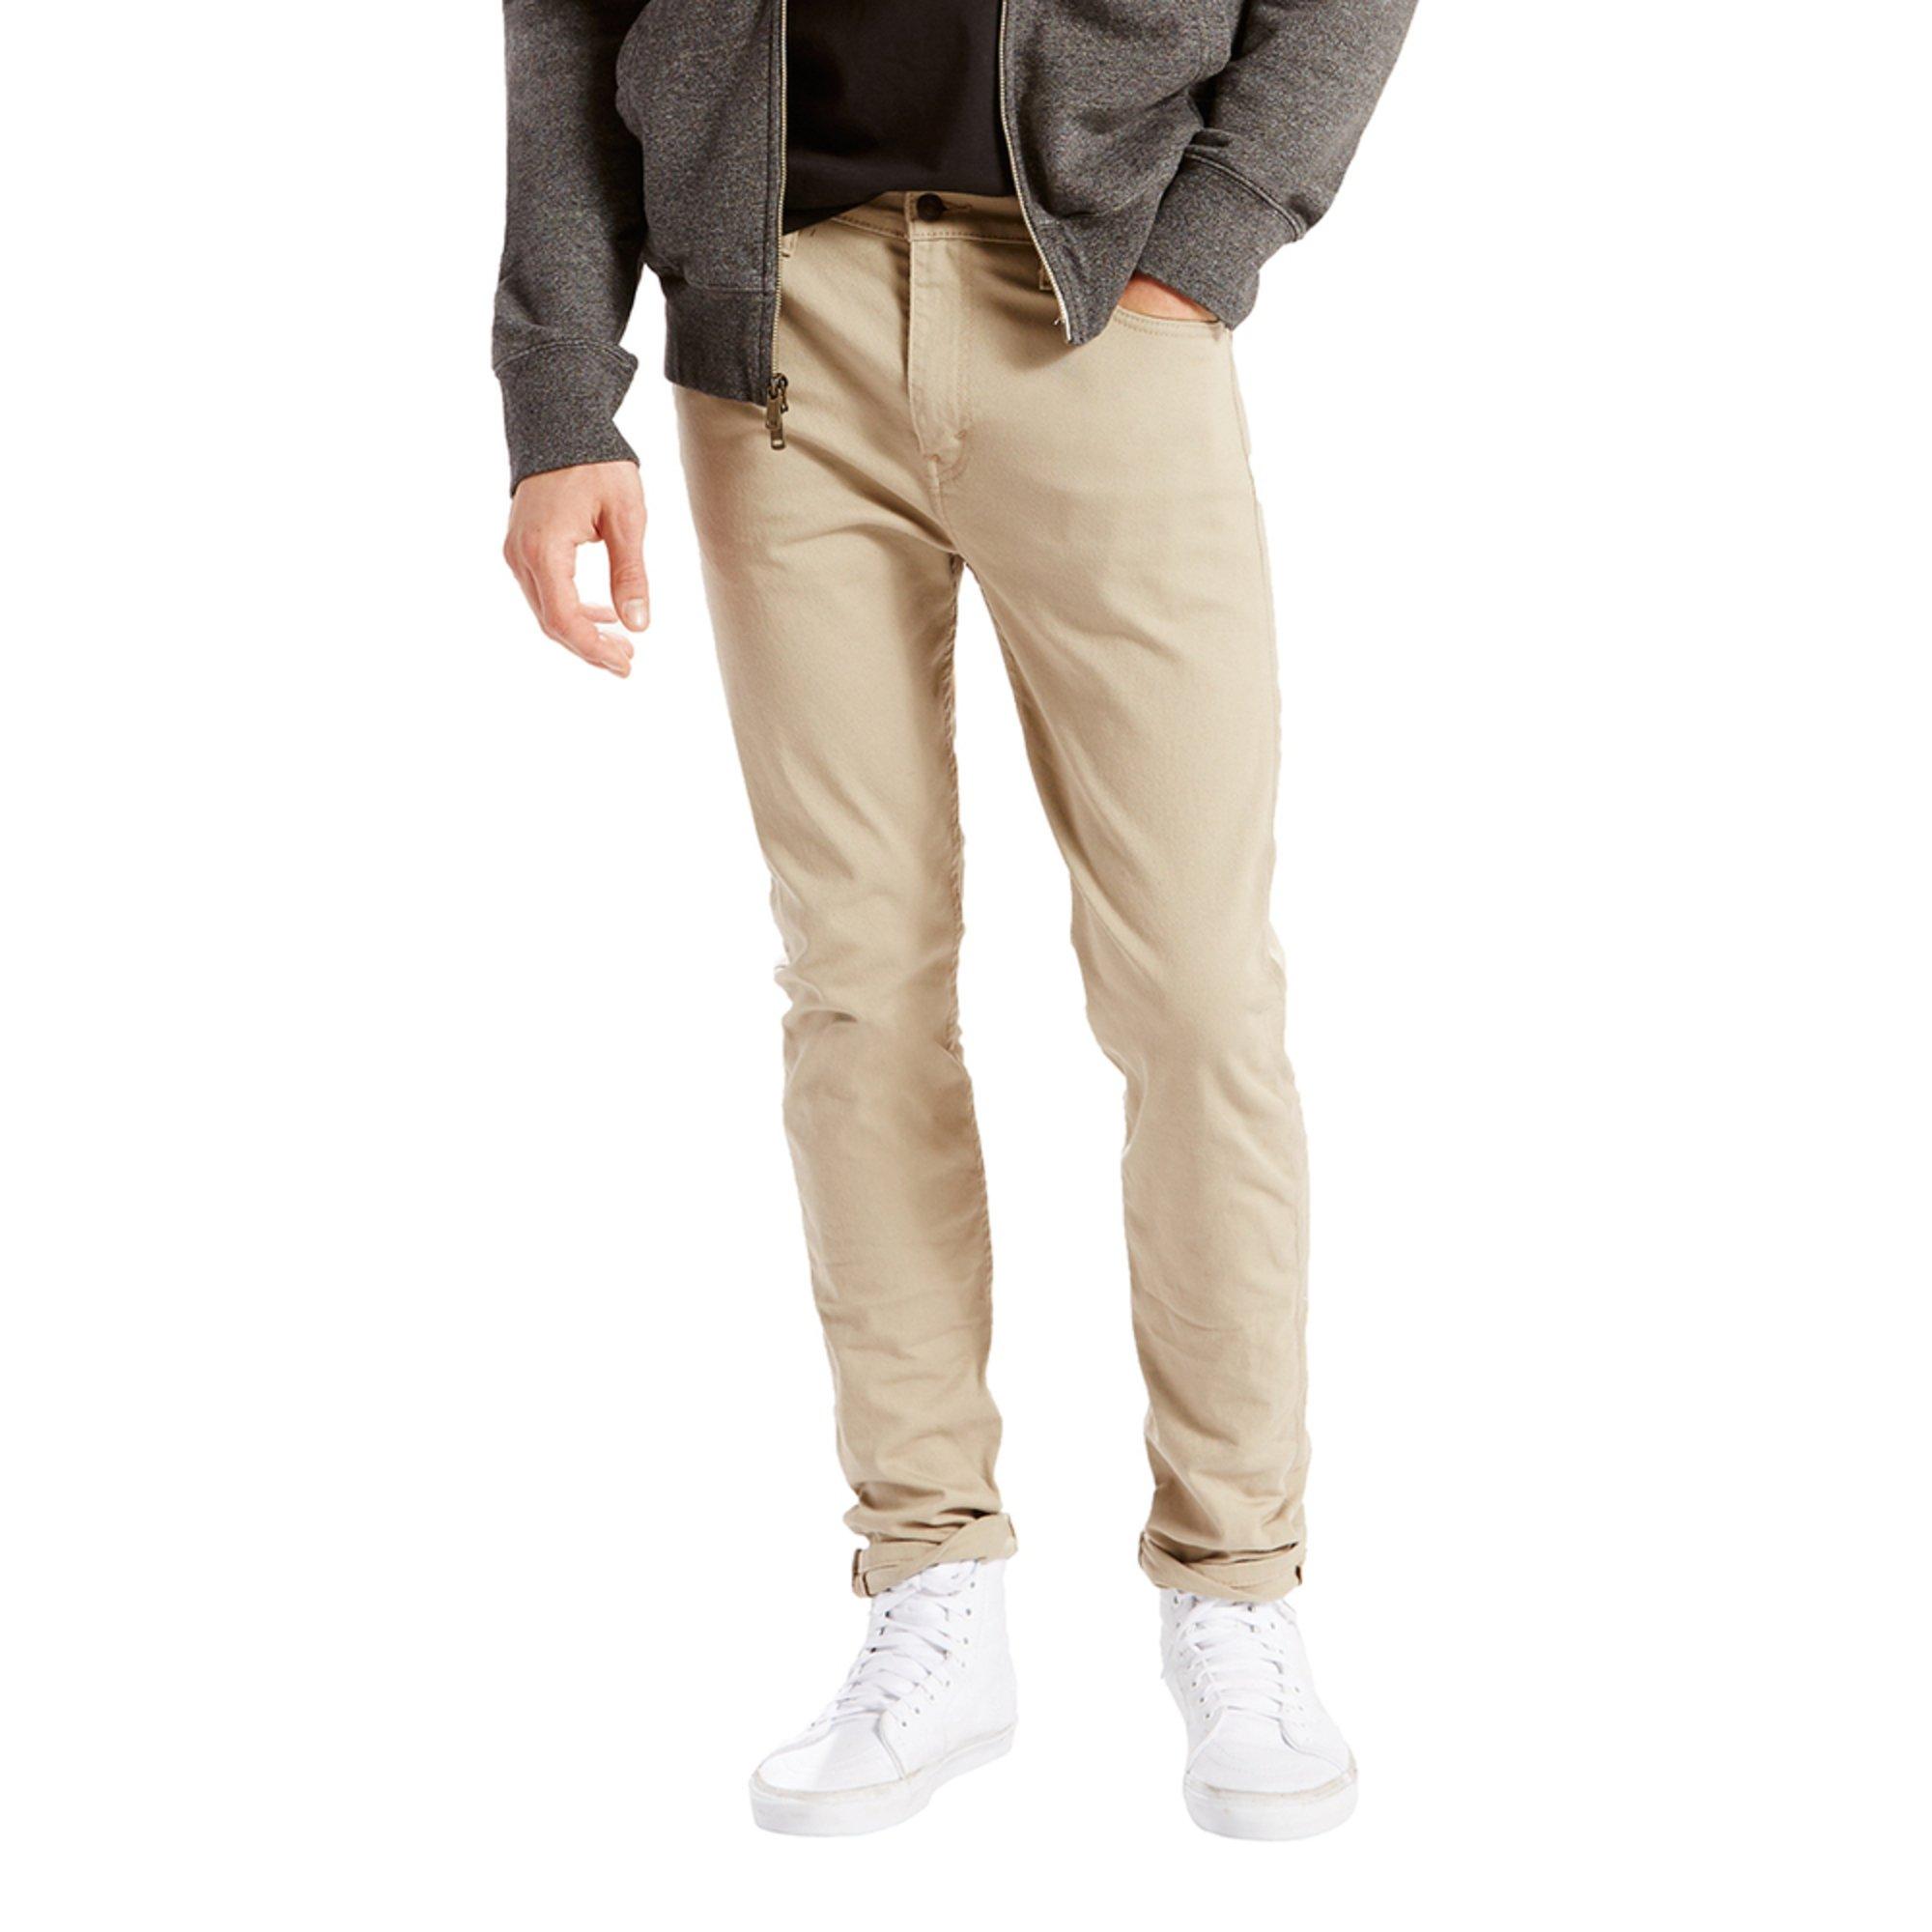 0a878cb1afe964 Levi's Men's 510 Skinny Bull Denim Color Jeans   Men's Jeans ...